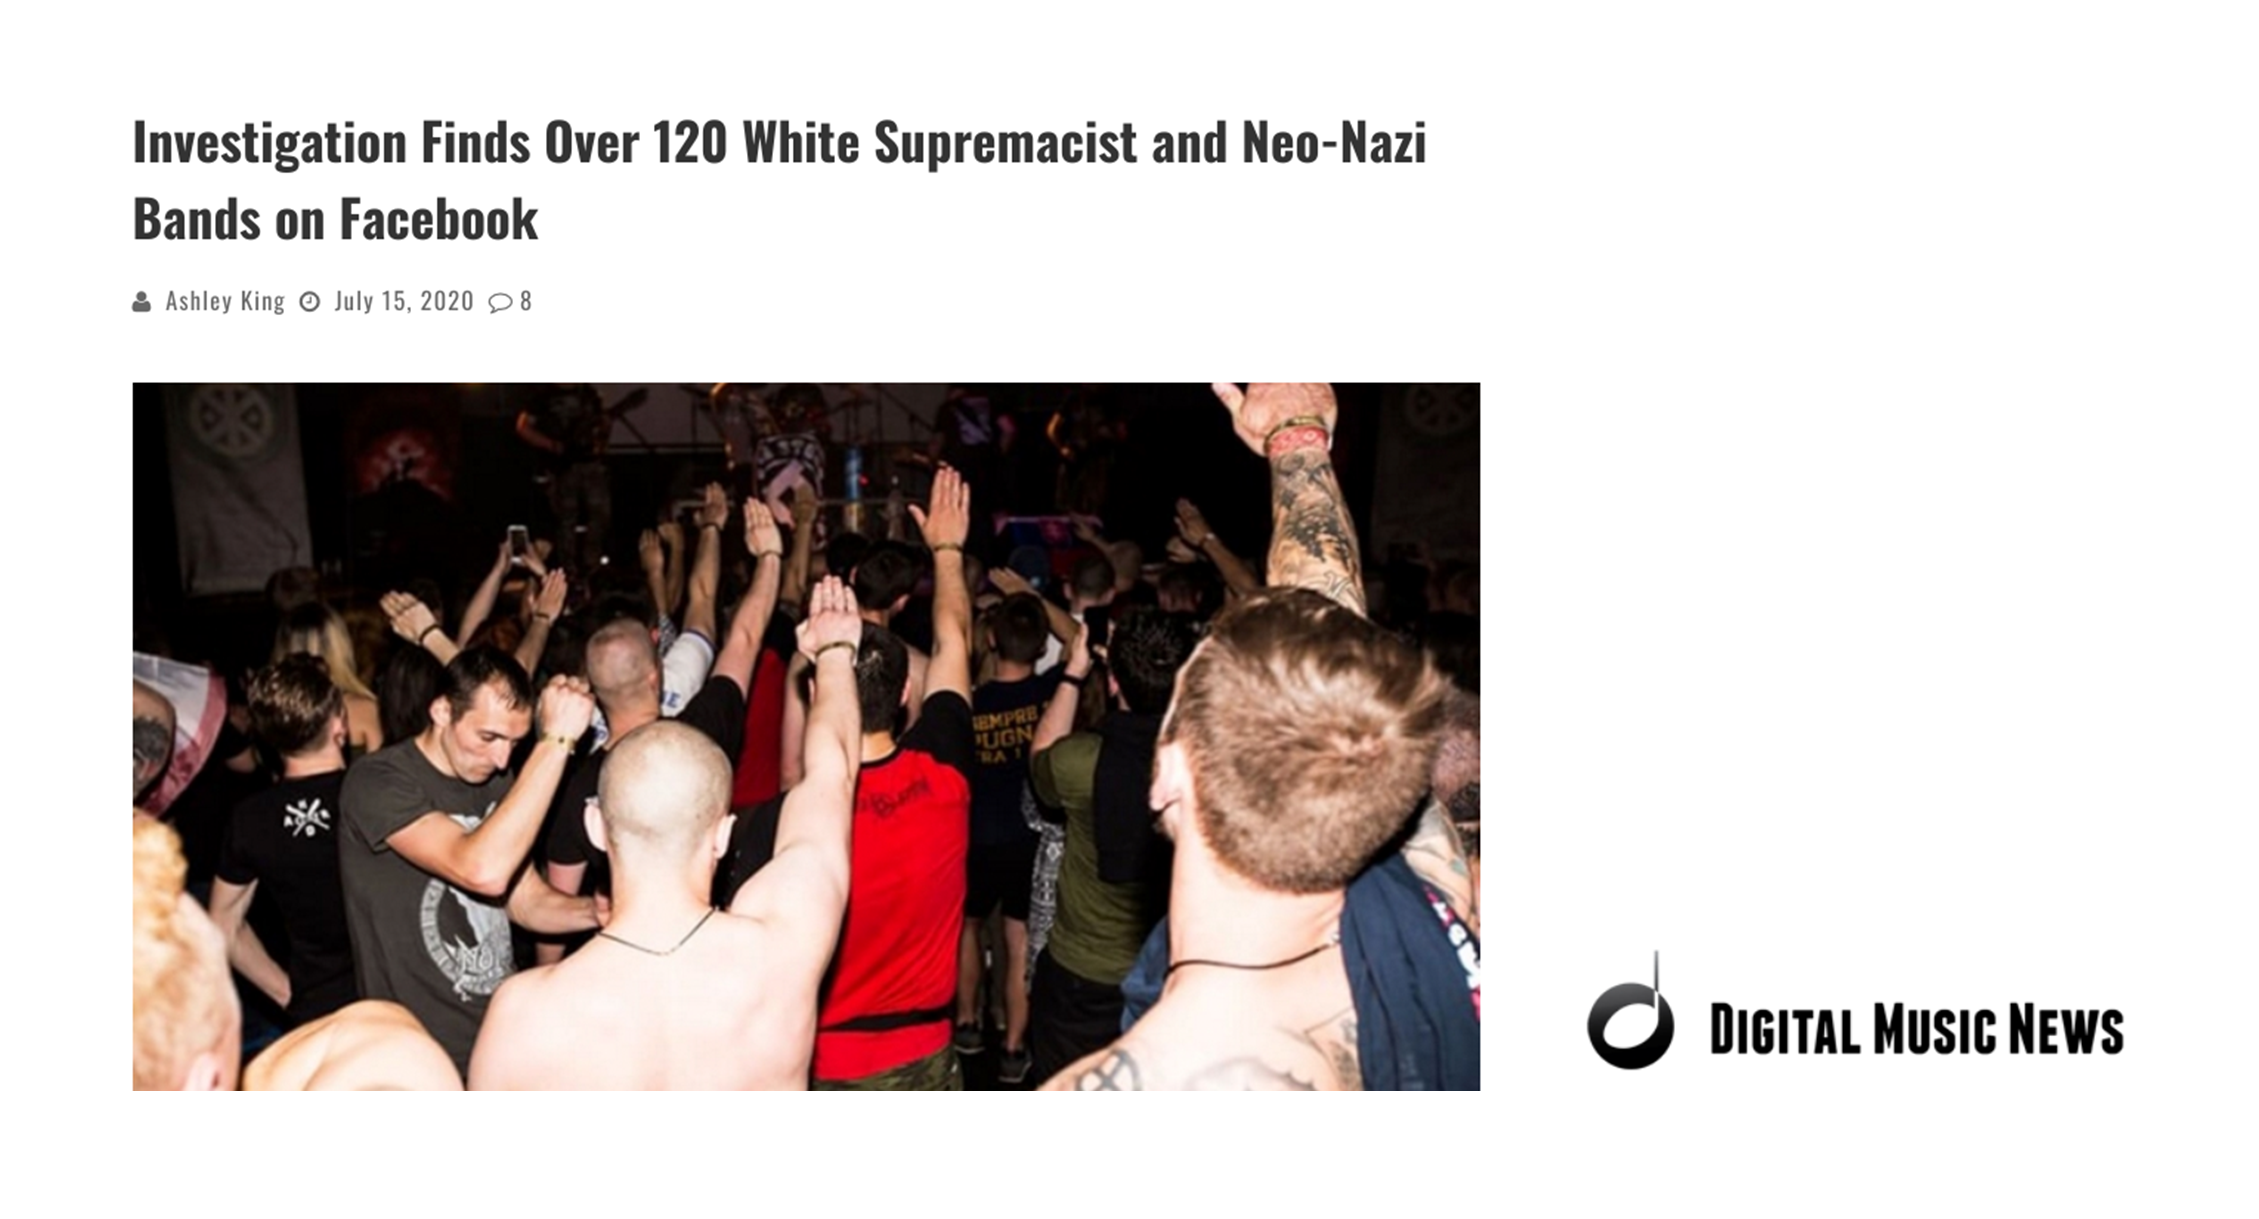 Investigation Finds Neo-Nazi Bands on Facebook